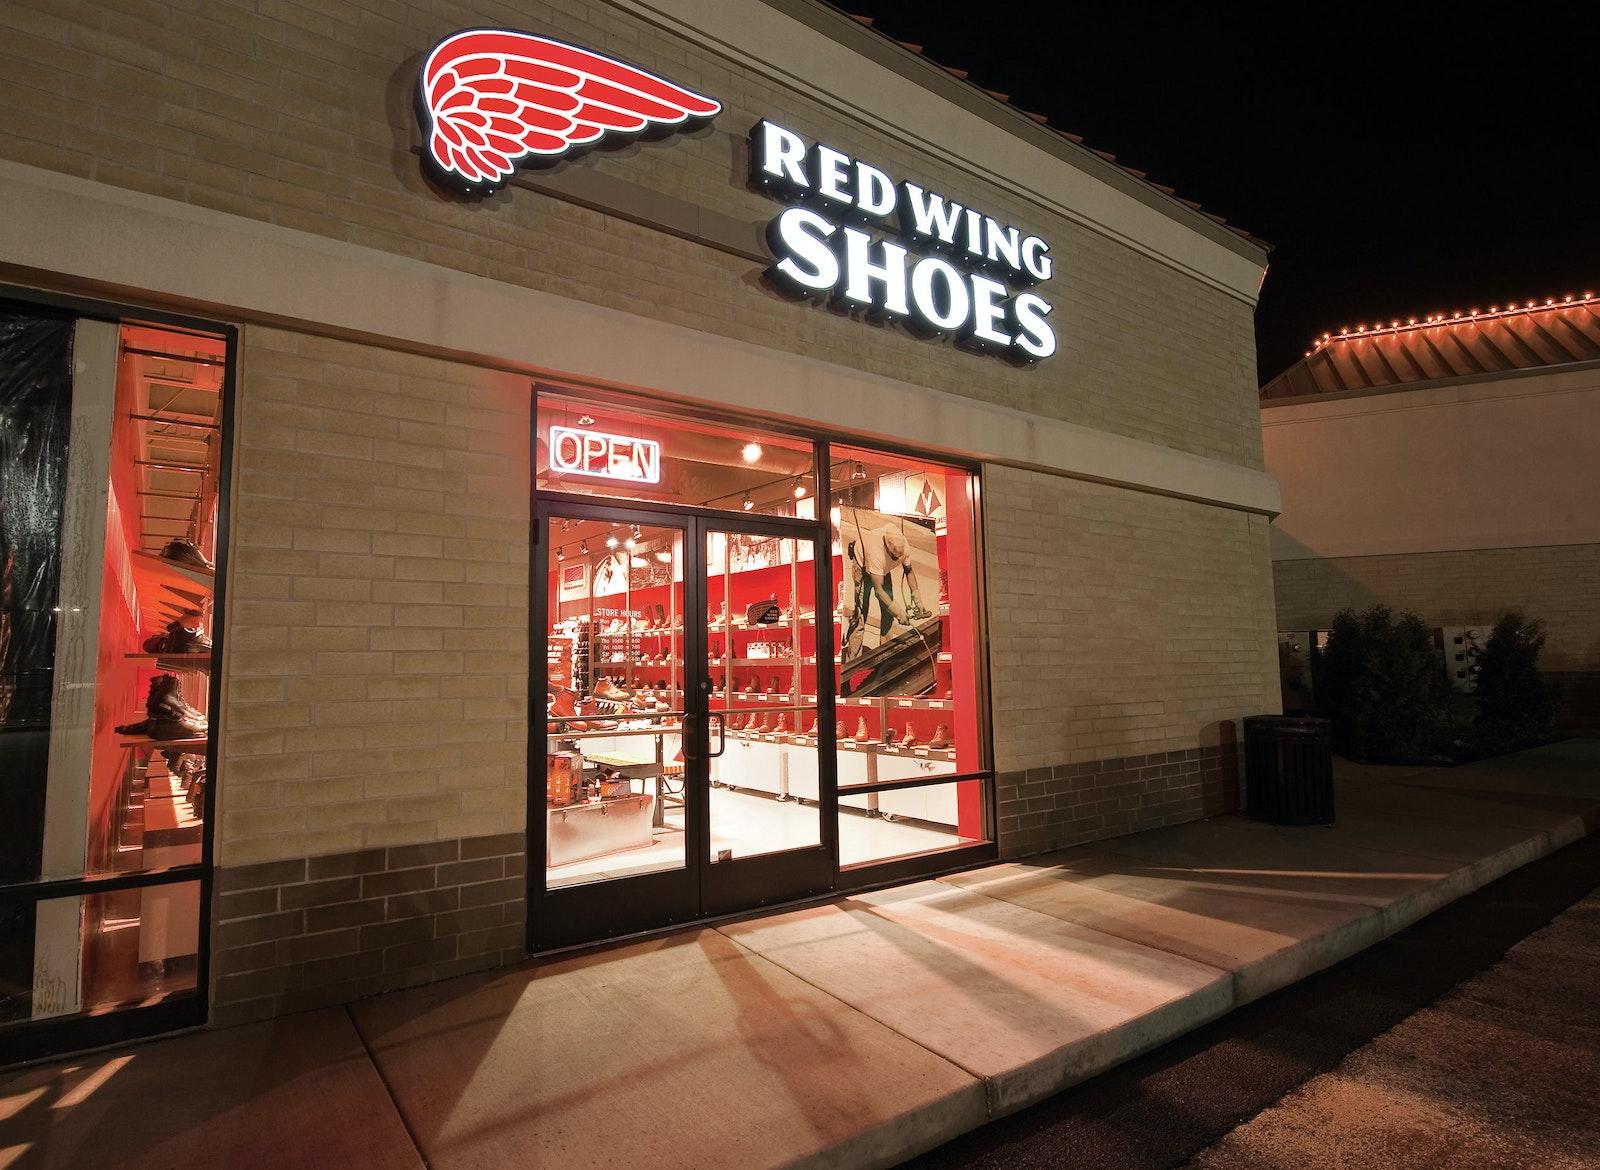 Red Wing Irish Setter Store Outside A